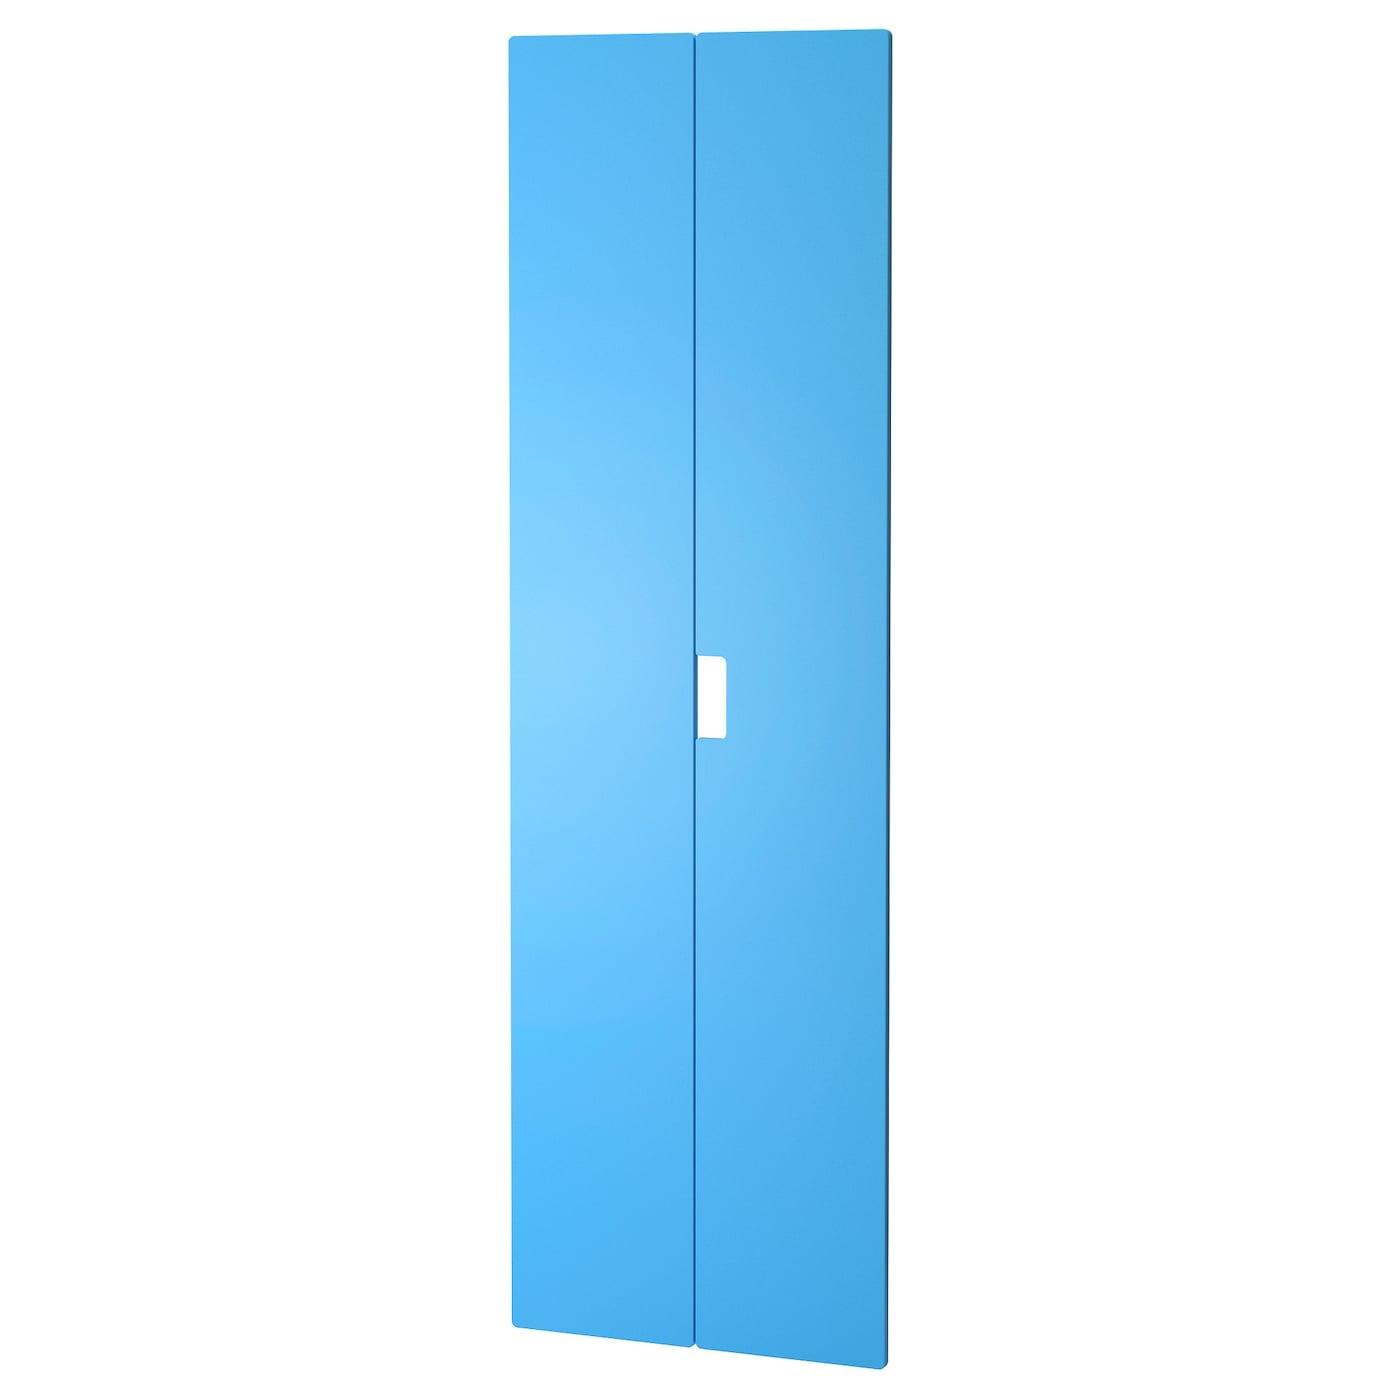 Stuva m lad porte bleu 60x192 cm ikea for Porte 60 cm ikea